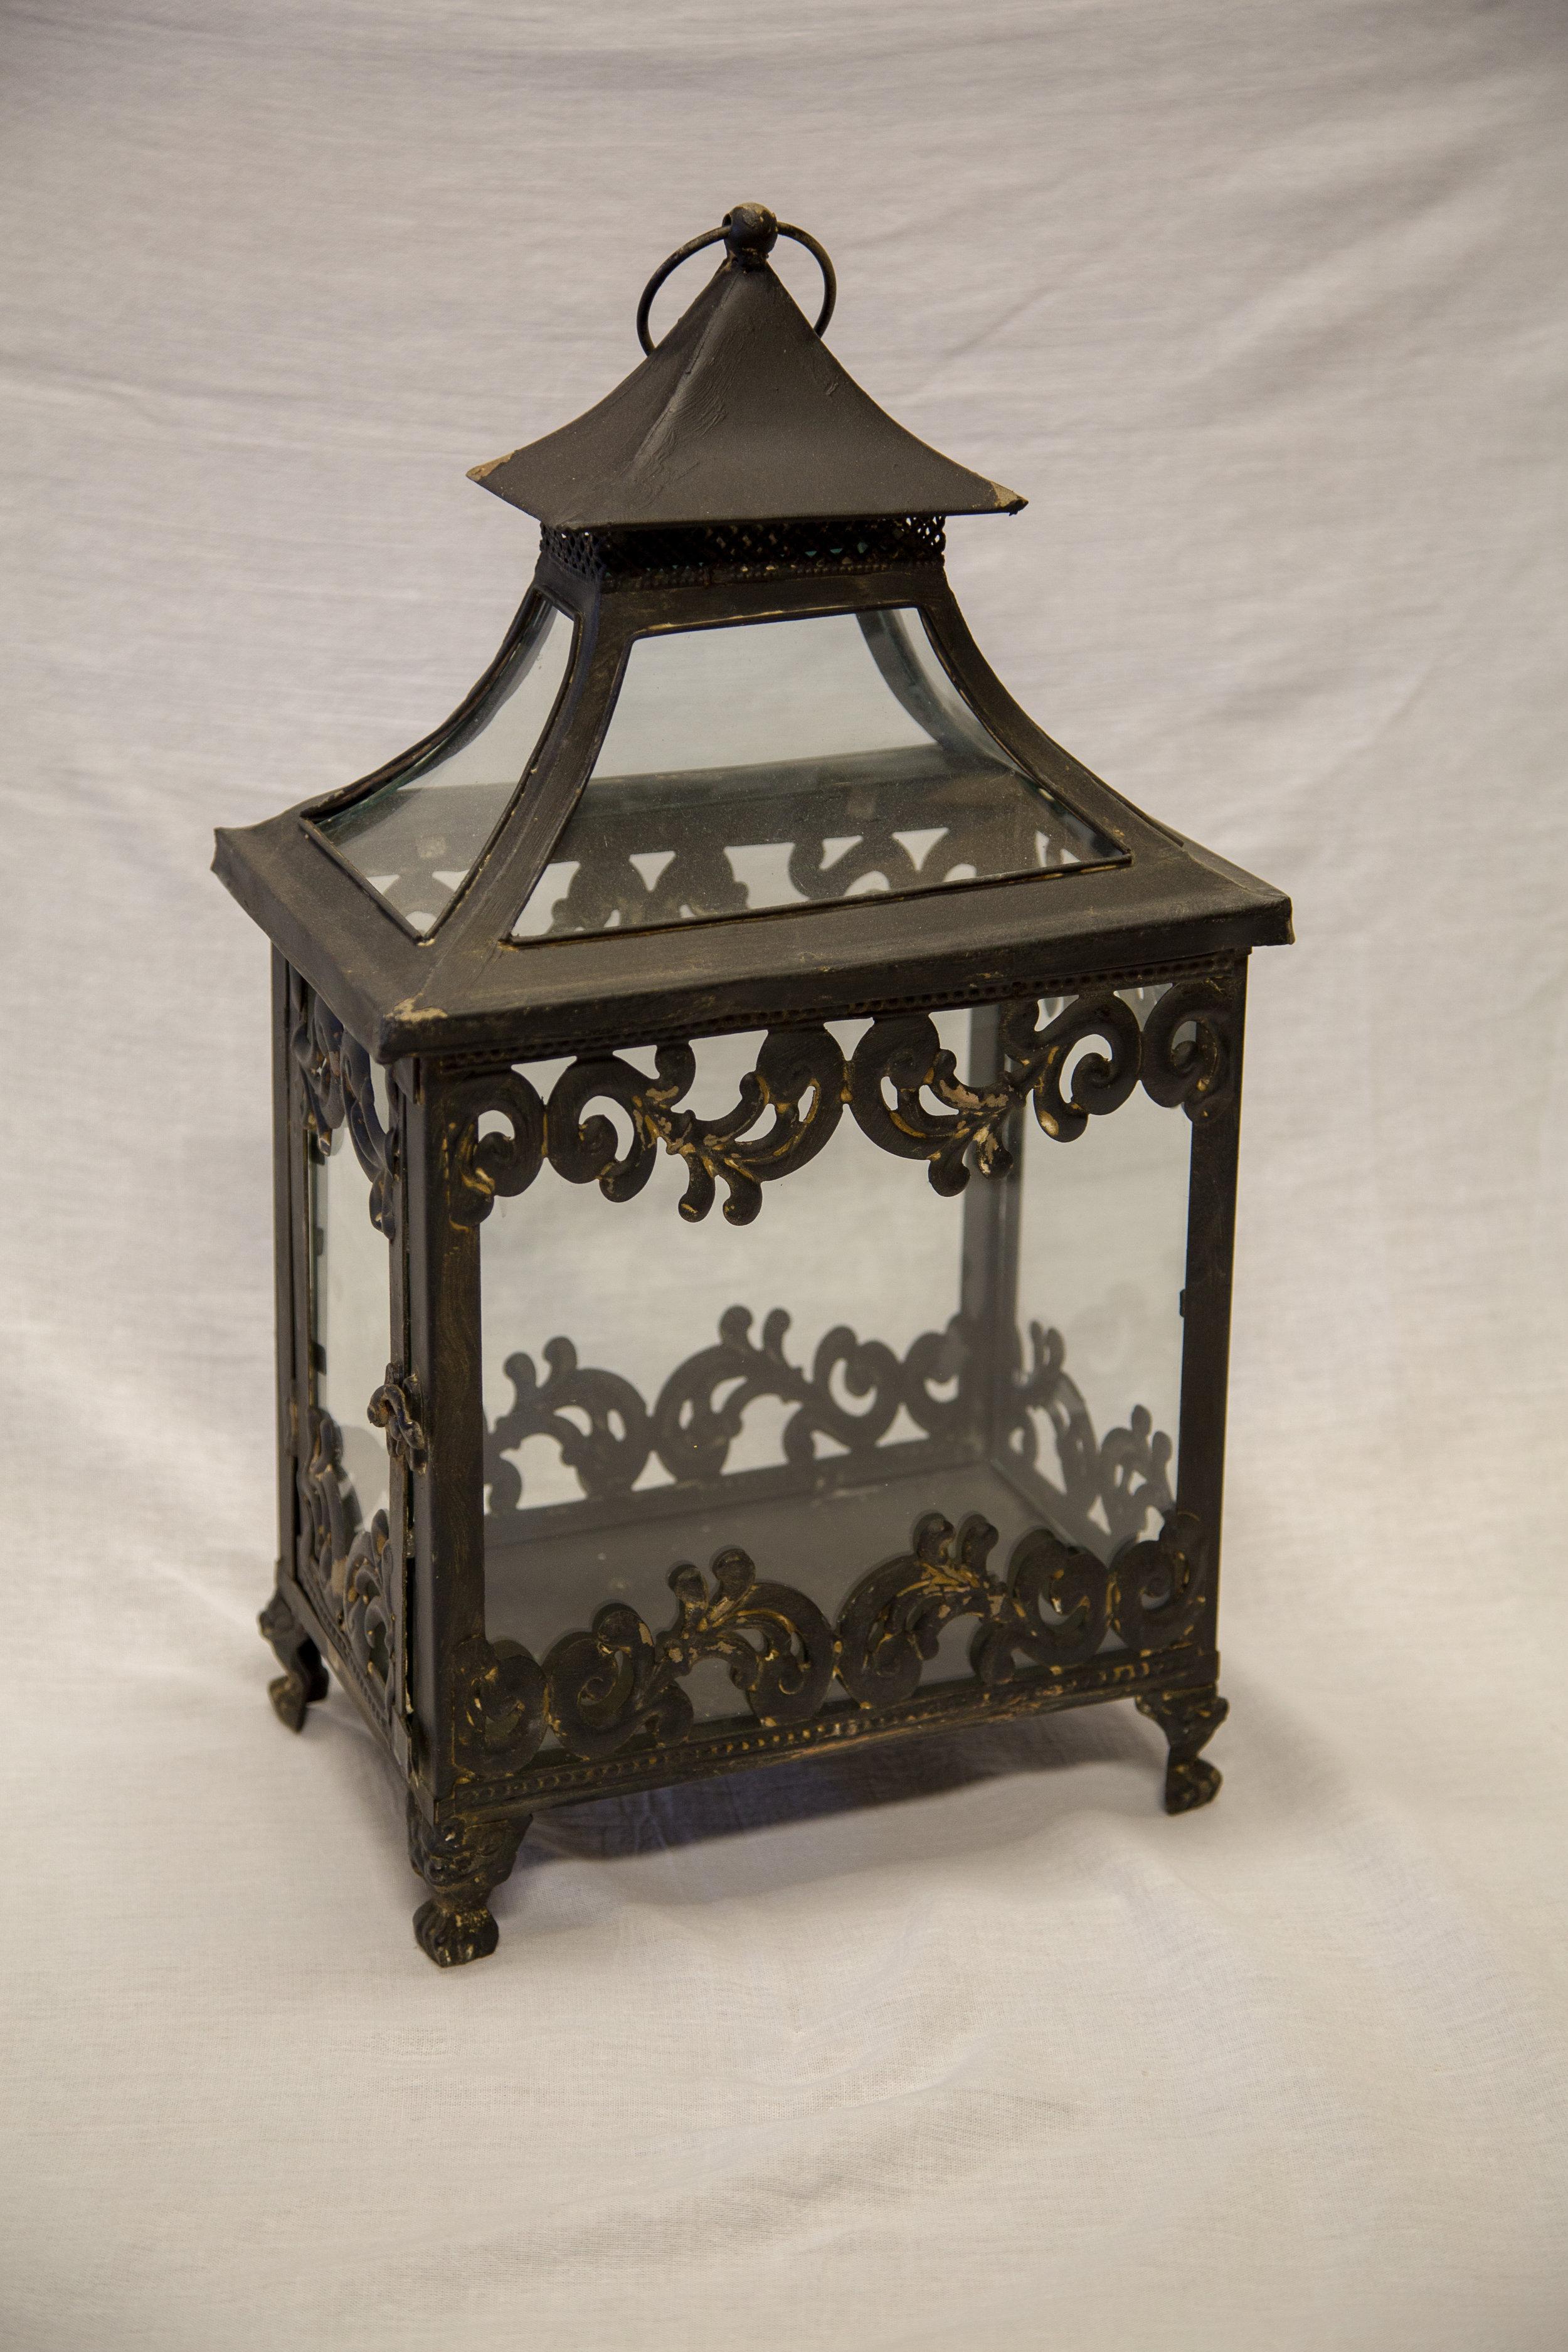 Black Distressed Scalloped Lantern - $10.00